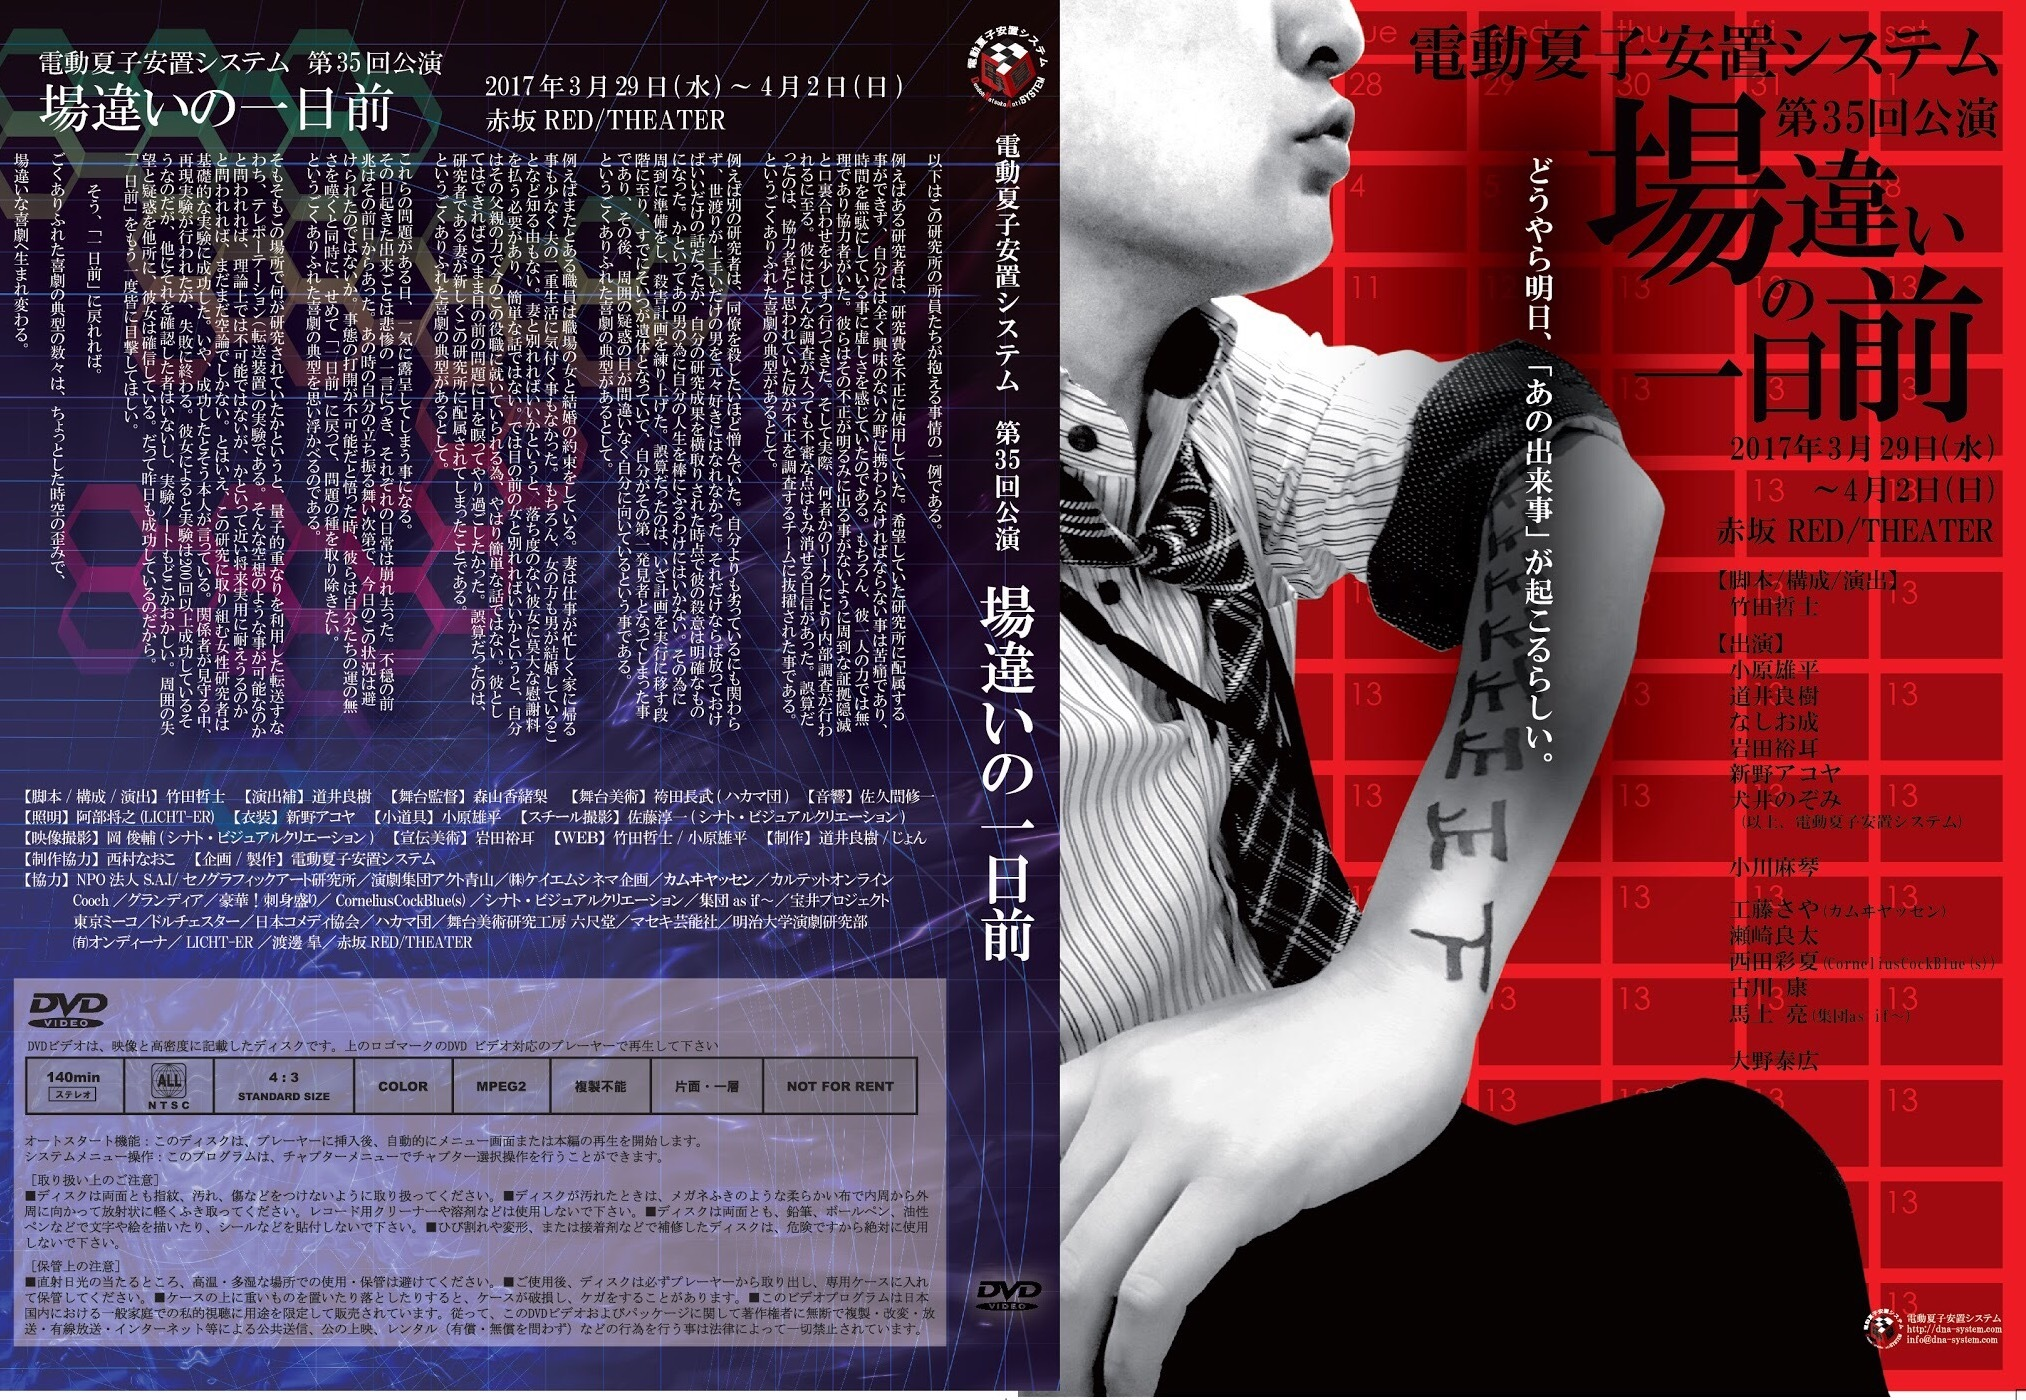 DVD 第35回公演『場違いの一日前』